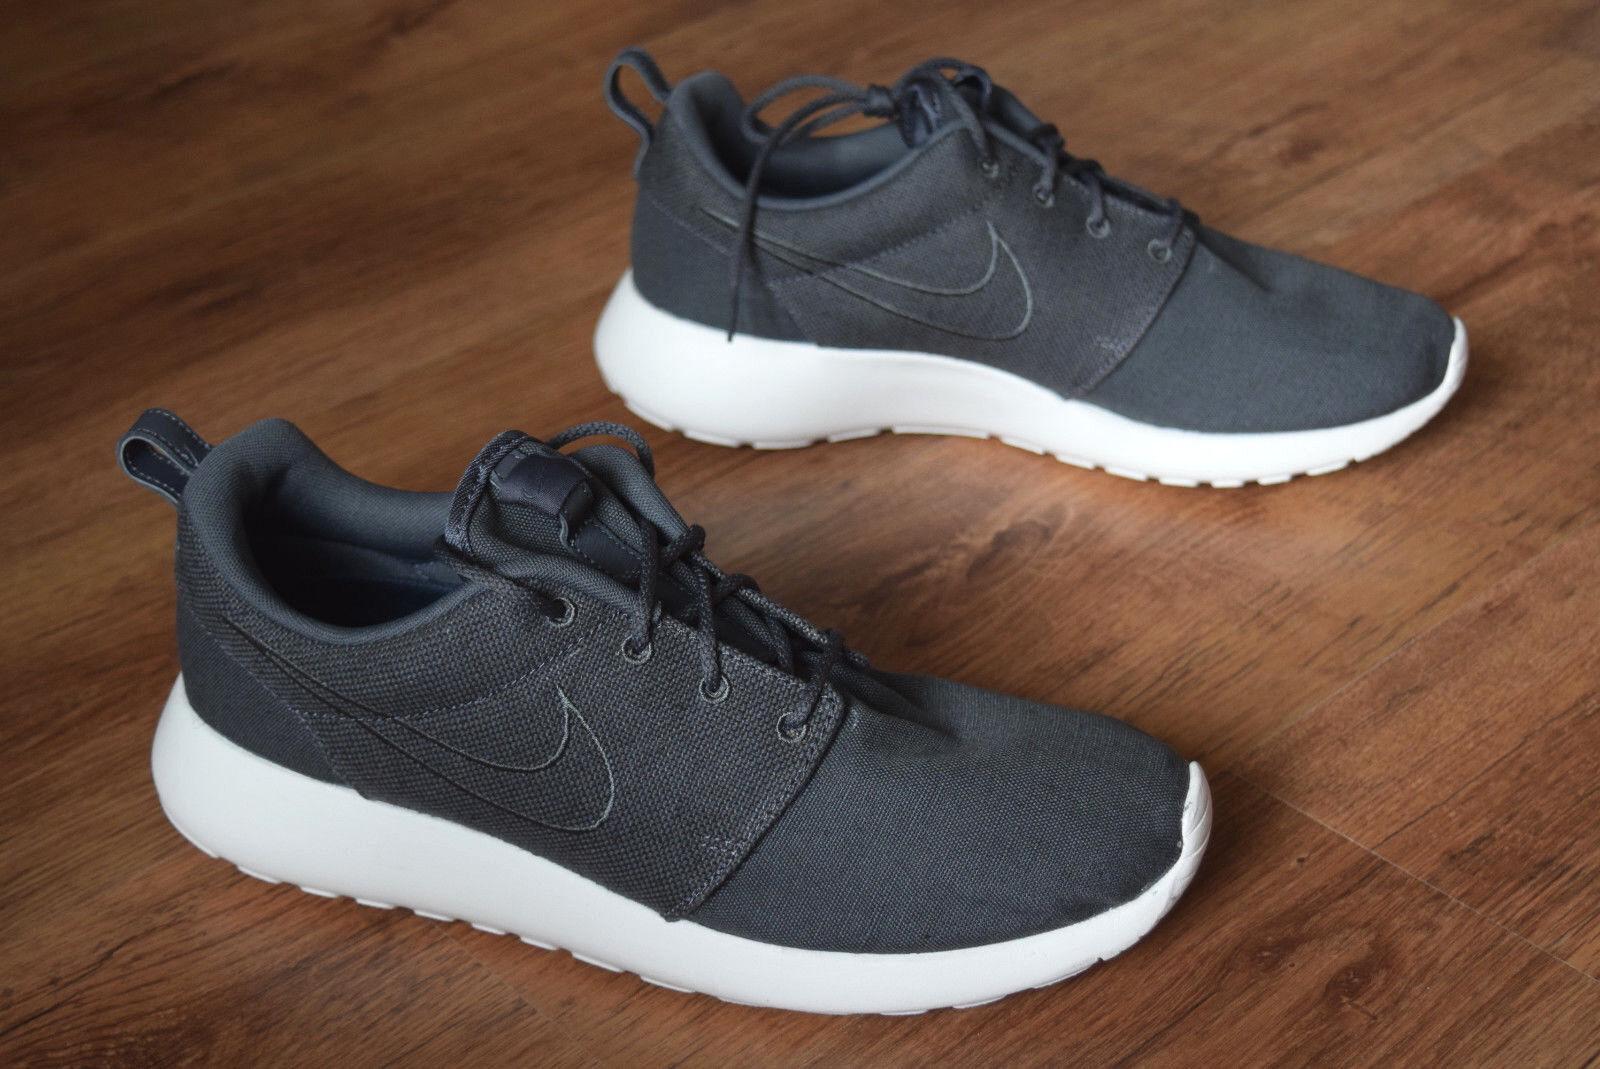 Nike roshe Two 41 42 44 45 46 47 One Free Run Air Max 1 Tavas